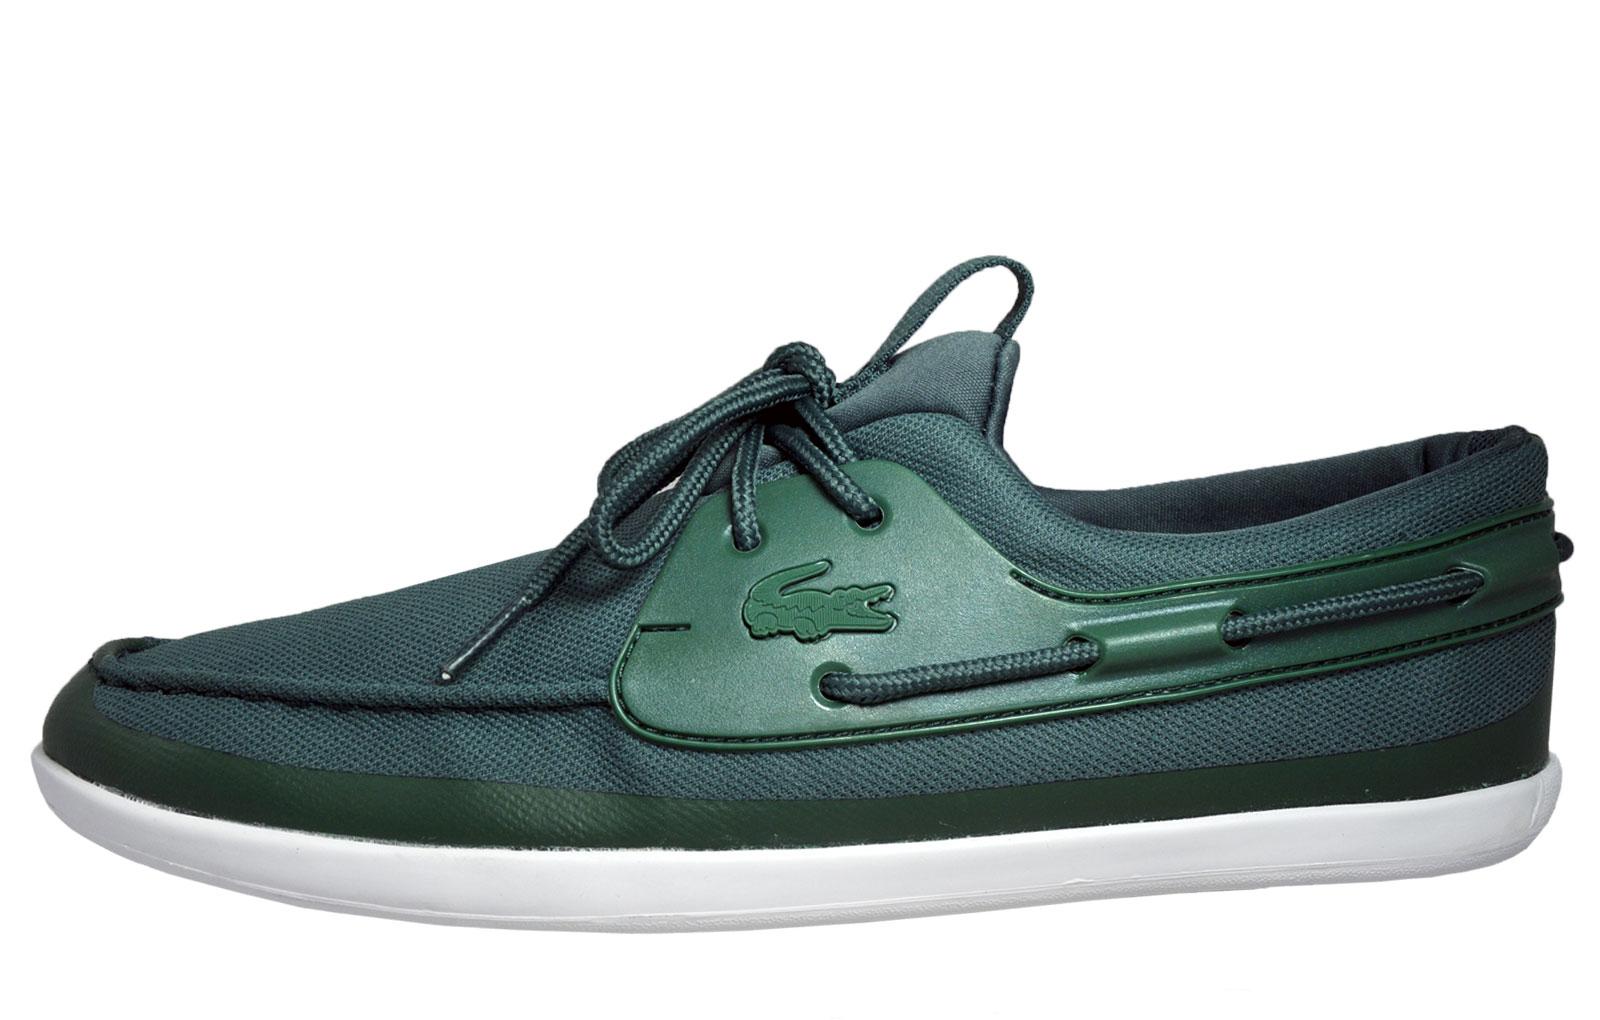 Lacoste Landsailing 216 Mens Classic Designer Boat Shoes